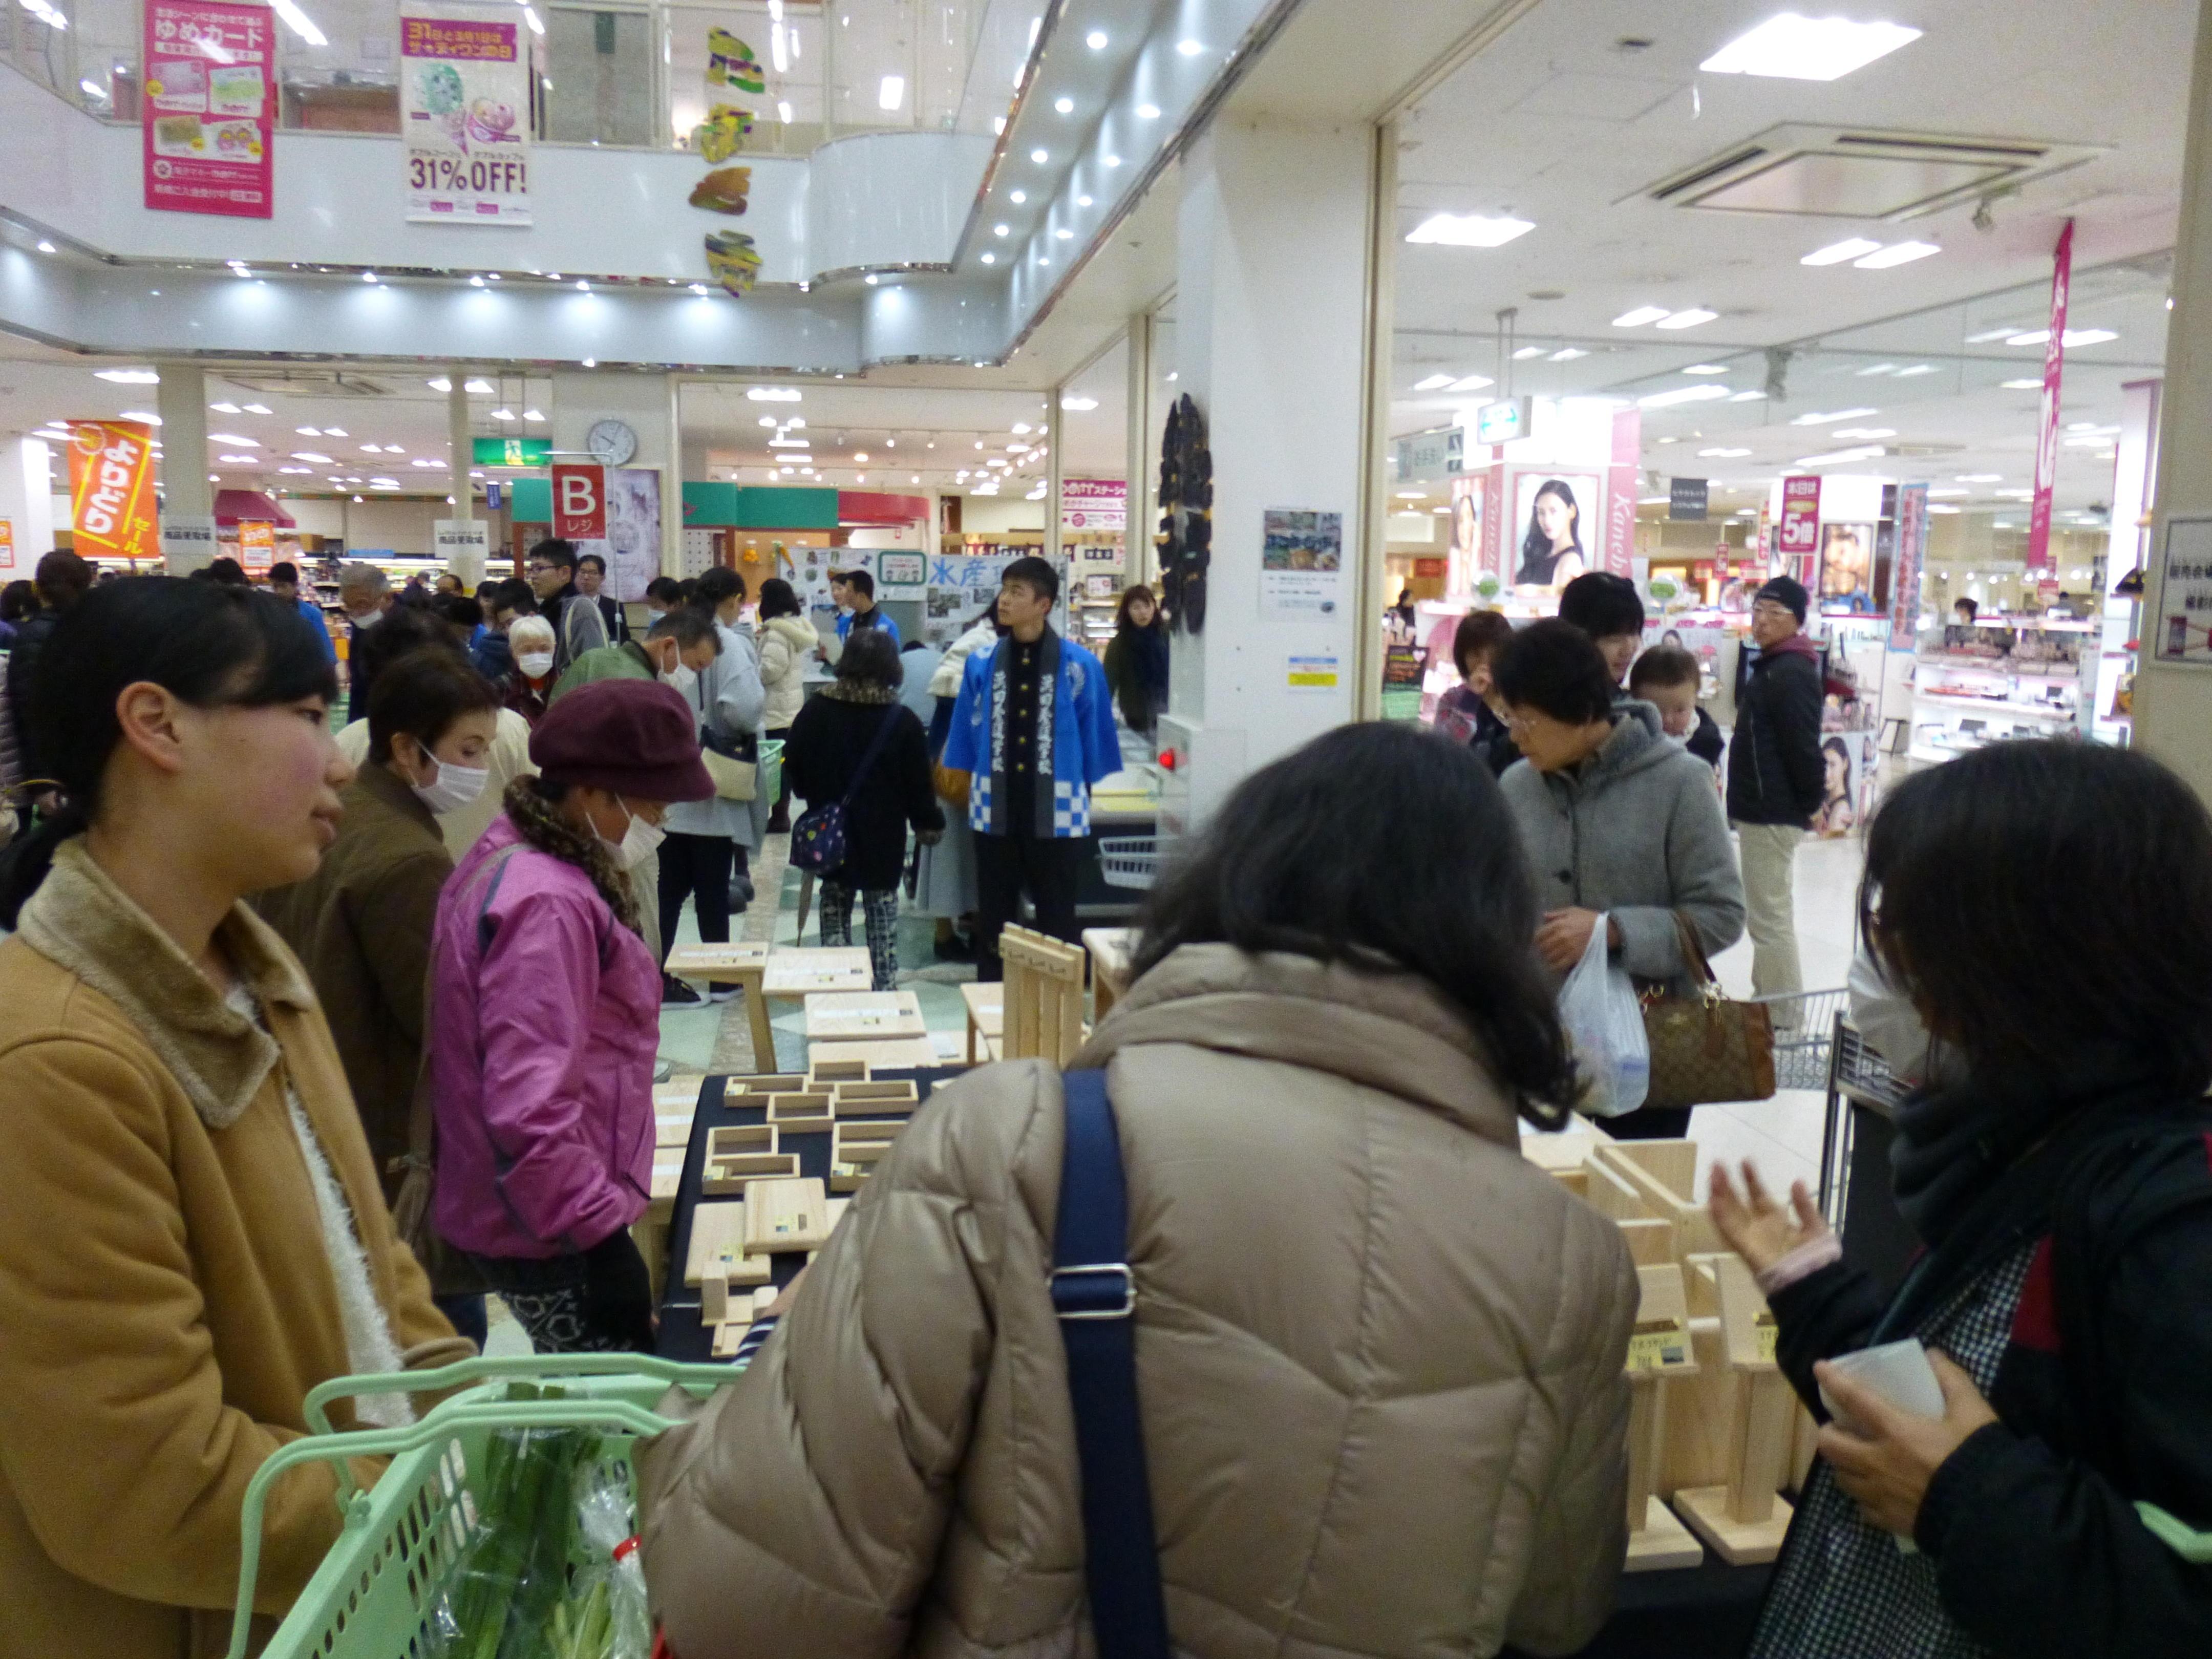 http://www.shimanet.ed.jp/hamadayougo/news/P1050108.JPG